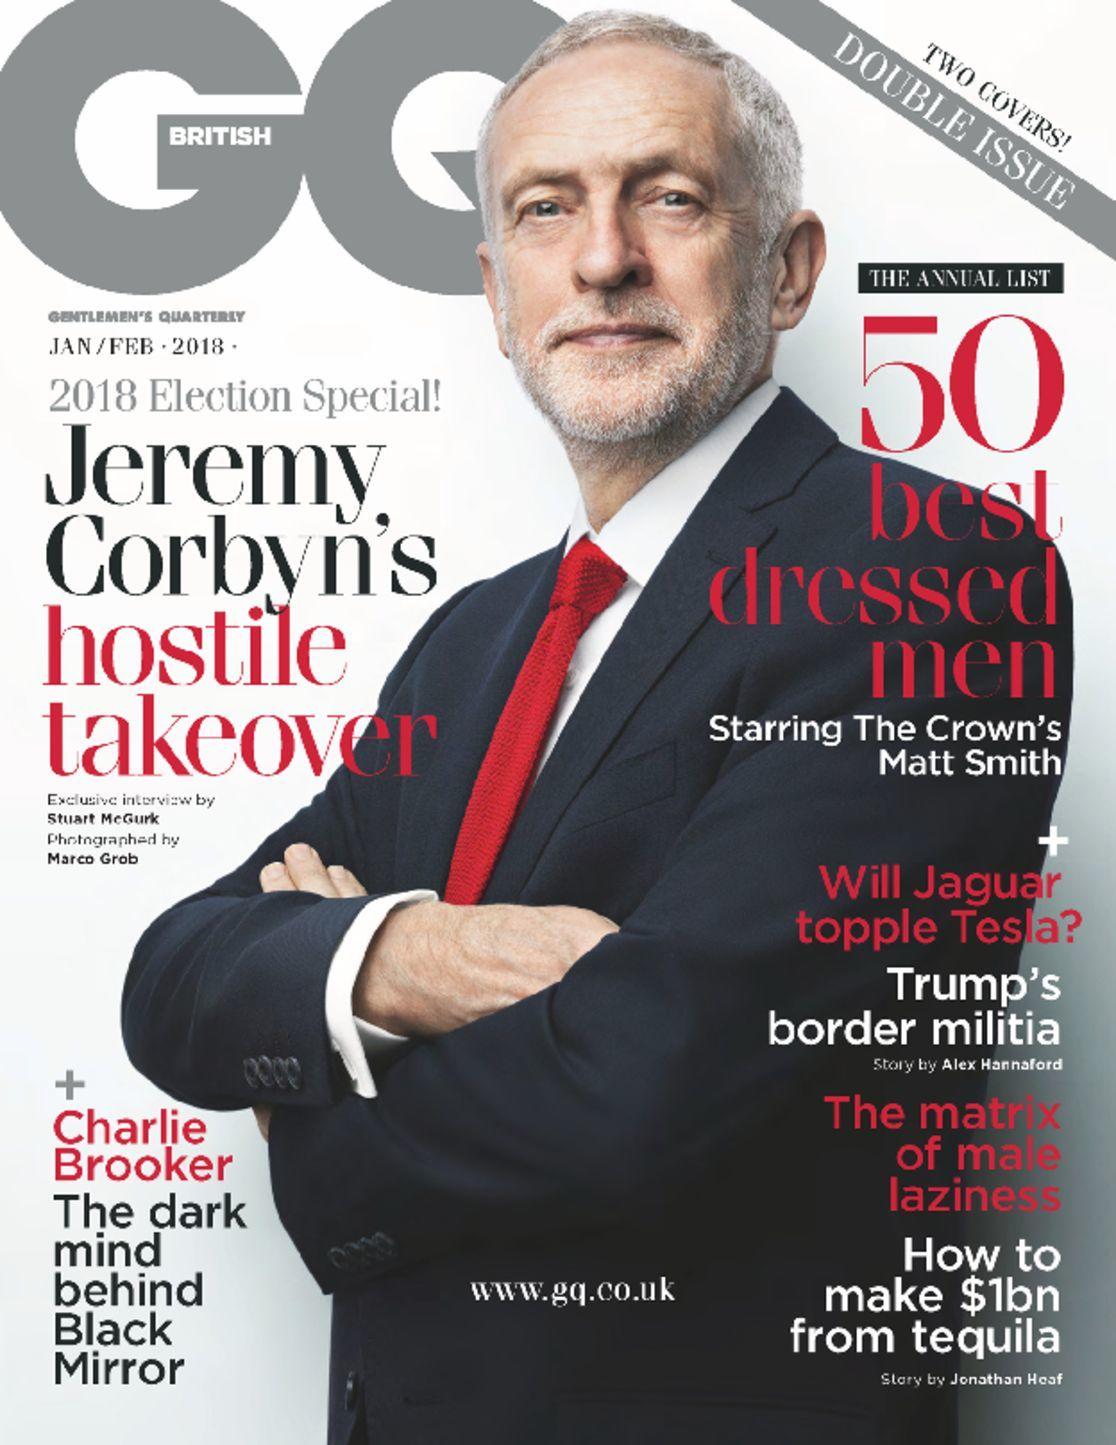 British GQ Digital